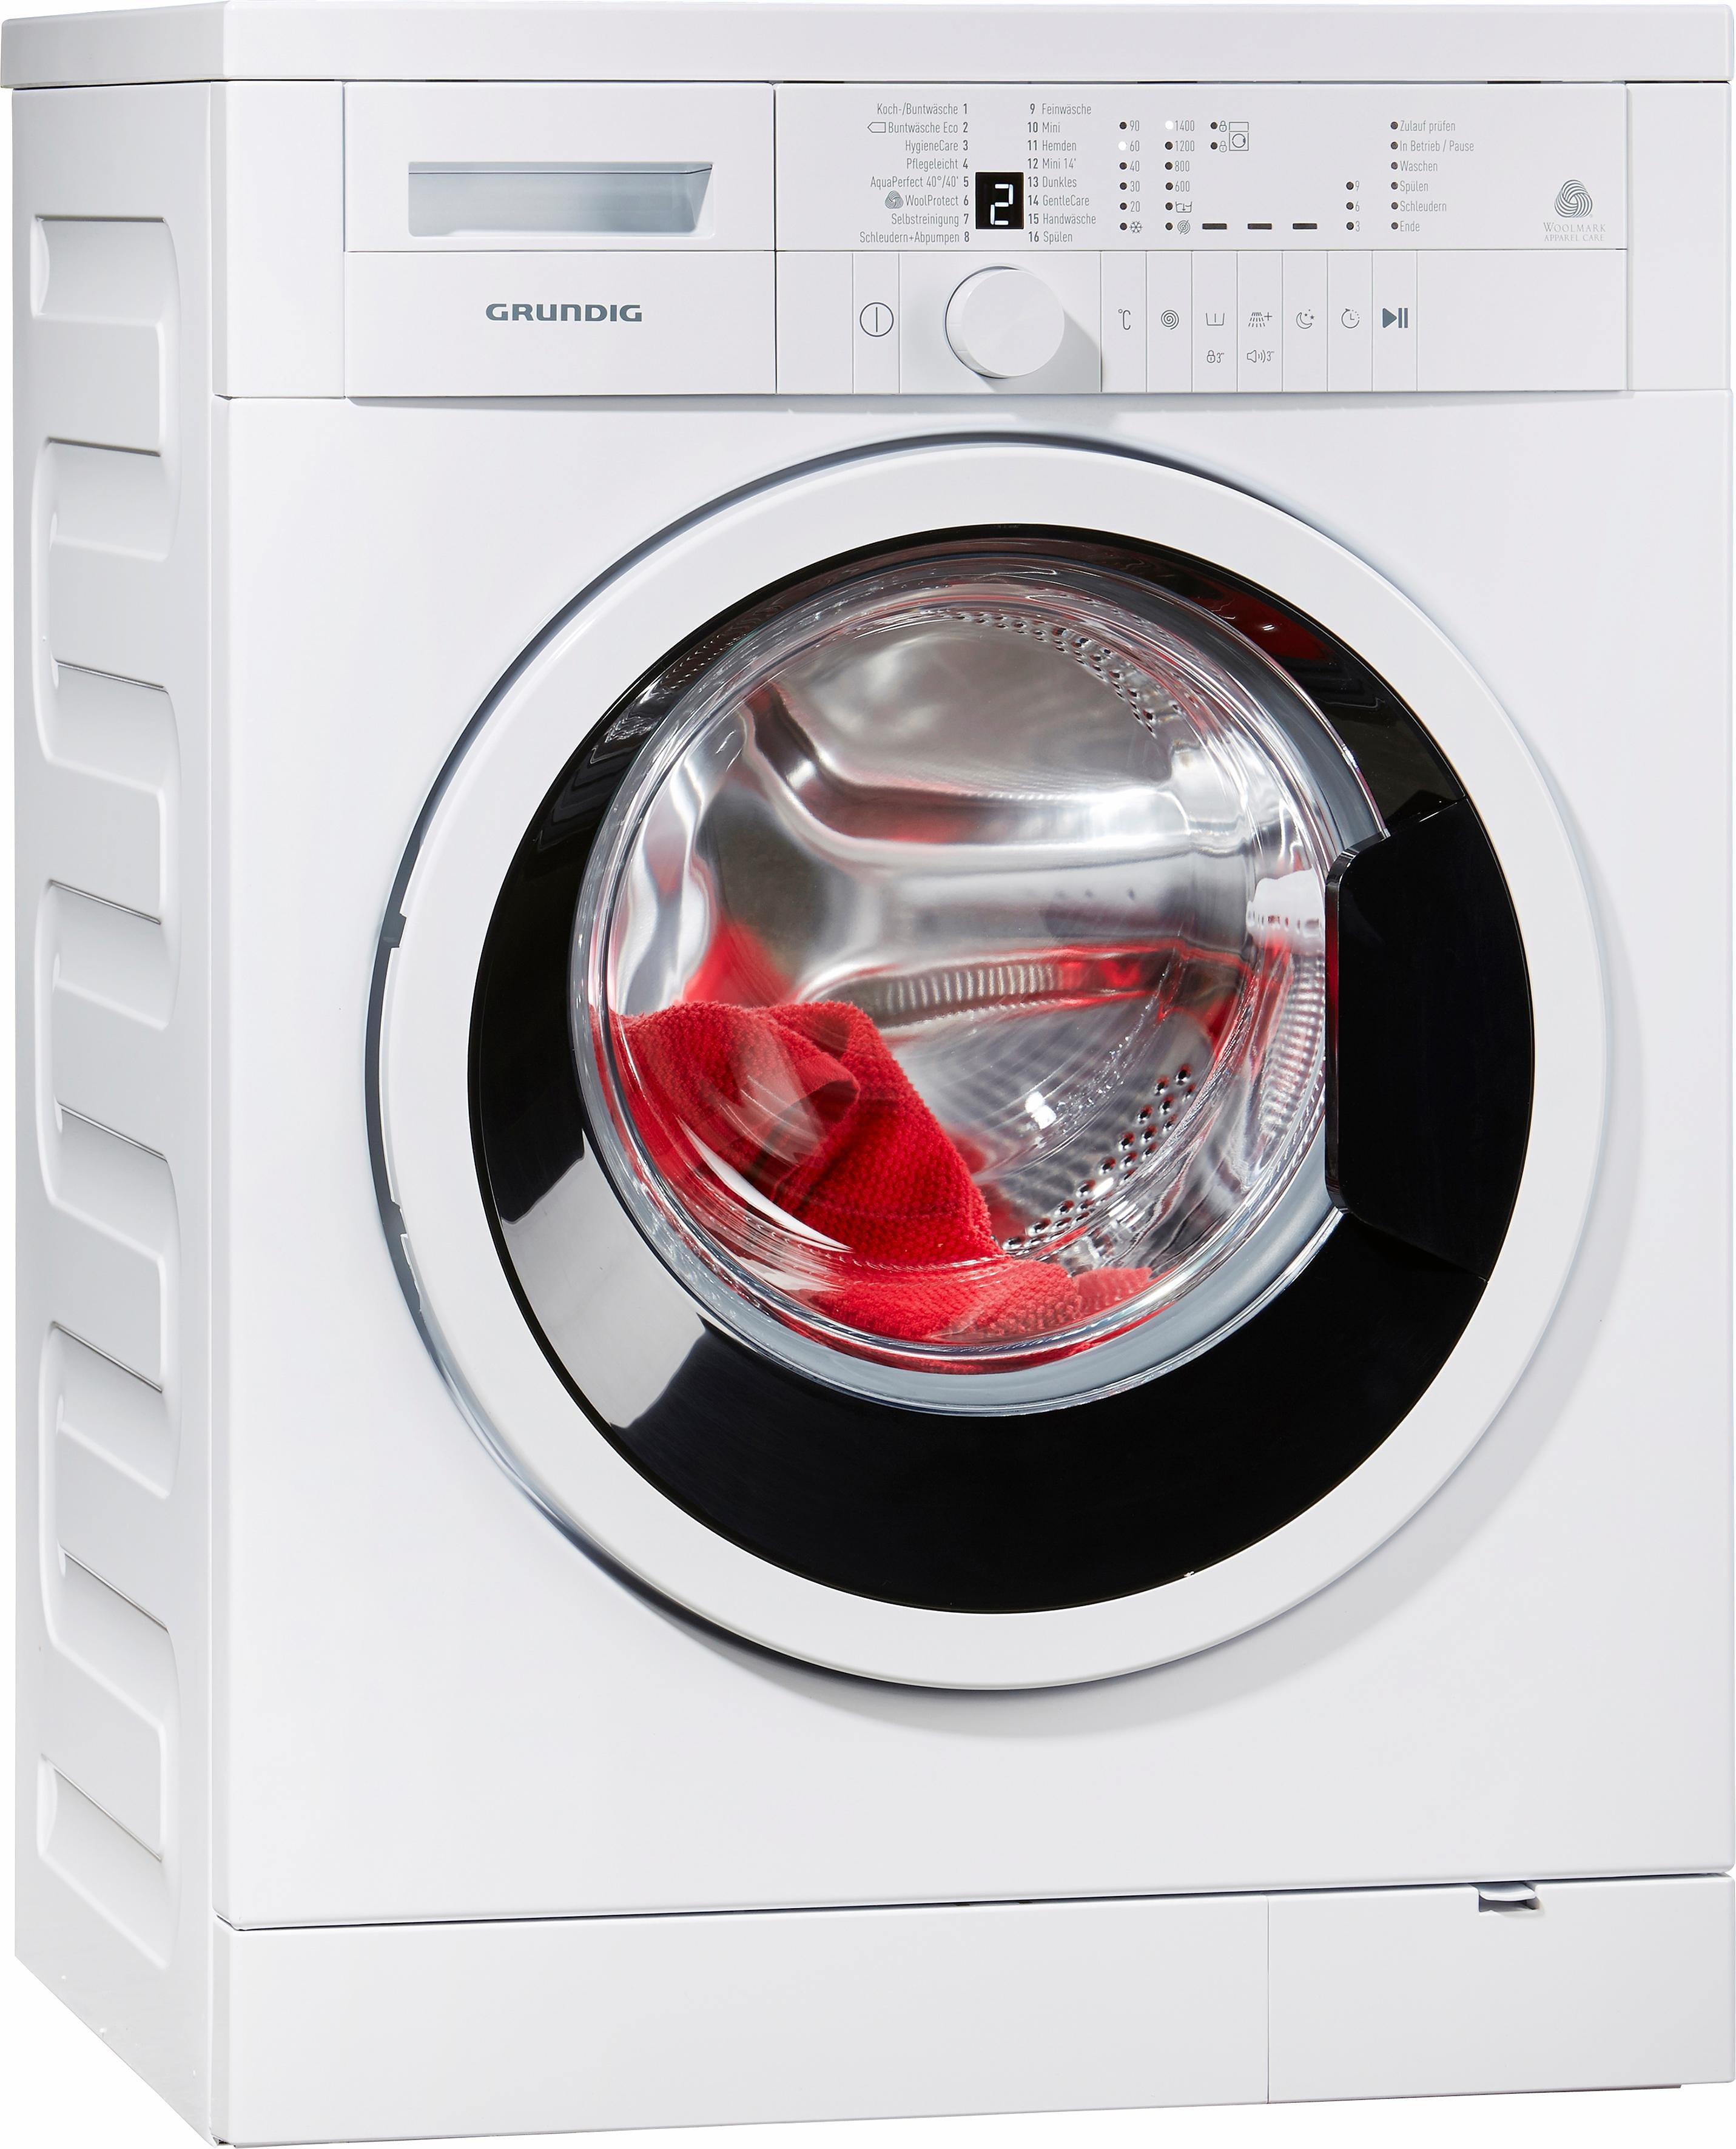 Grundig Waschmaschine GWN 26430, 6 kg, 1400 U/Min